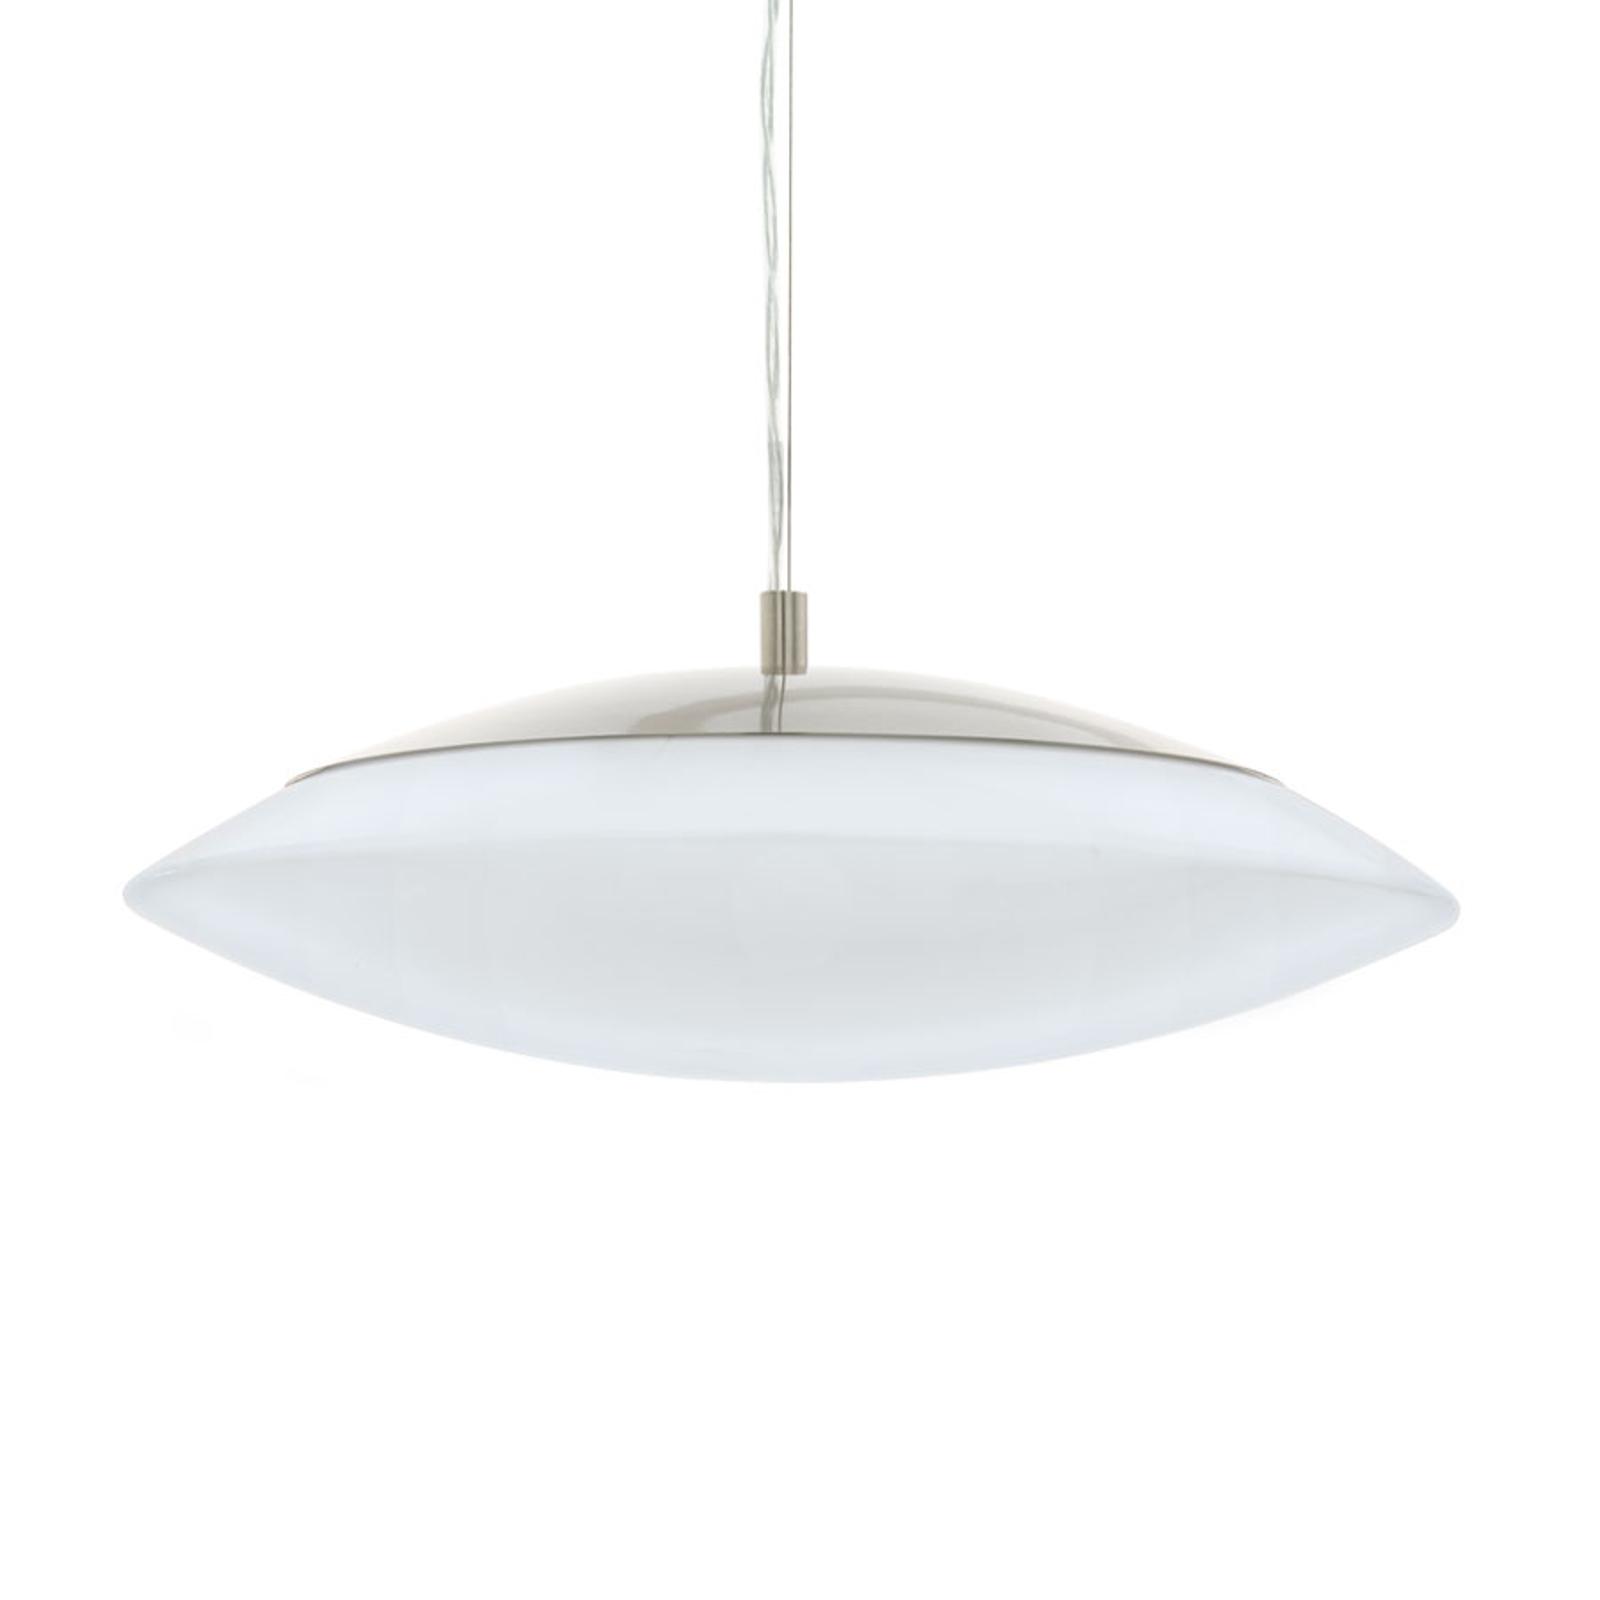 EGLO connect Frattina-C LED-Hängeleuchte